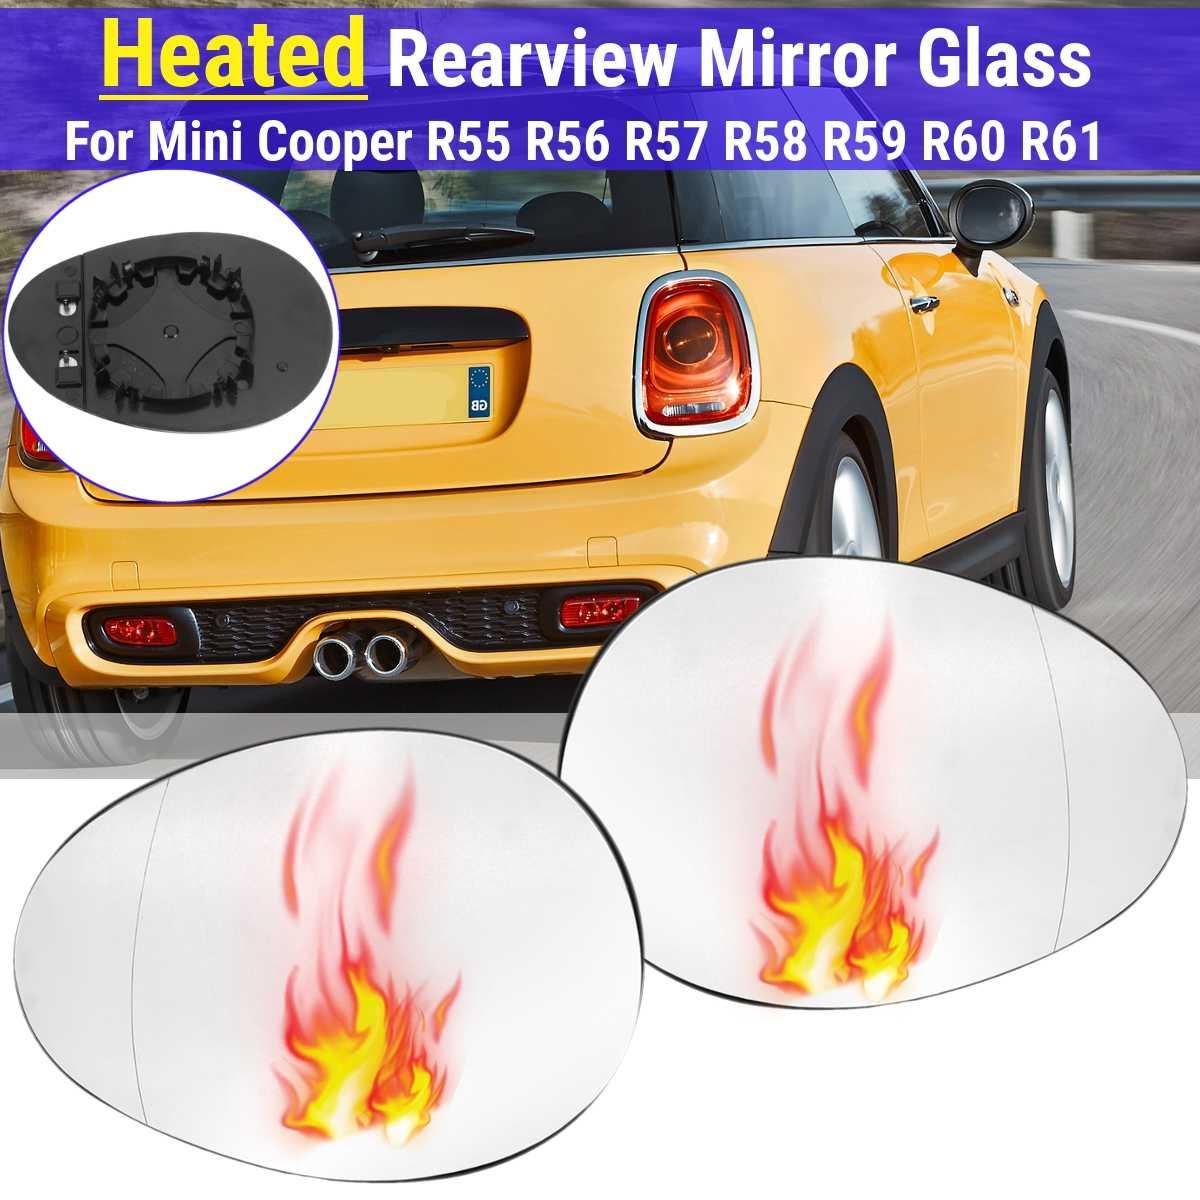 Car Antifog Heated Rearview Mirror Glass side wing mirror 51162755625 51162755630 For Mini Cooper R55 R56 R57 R58 R59 R60 R61